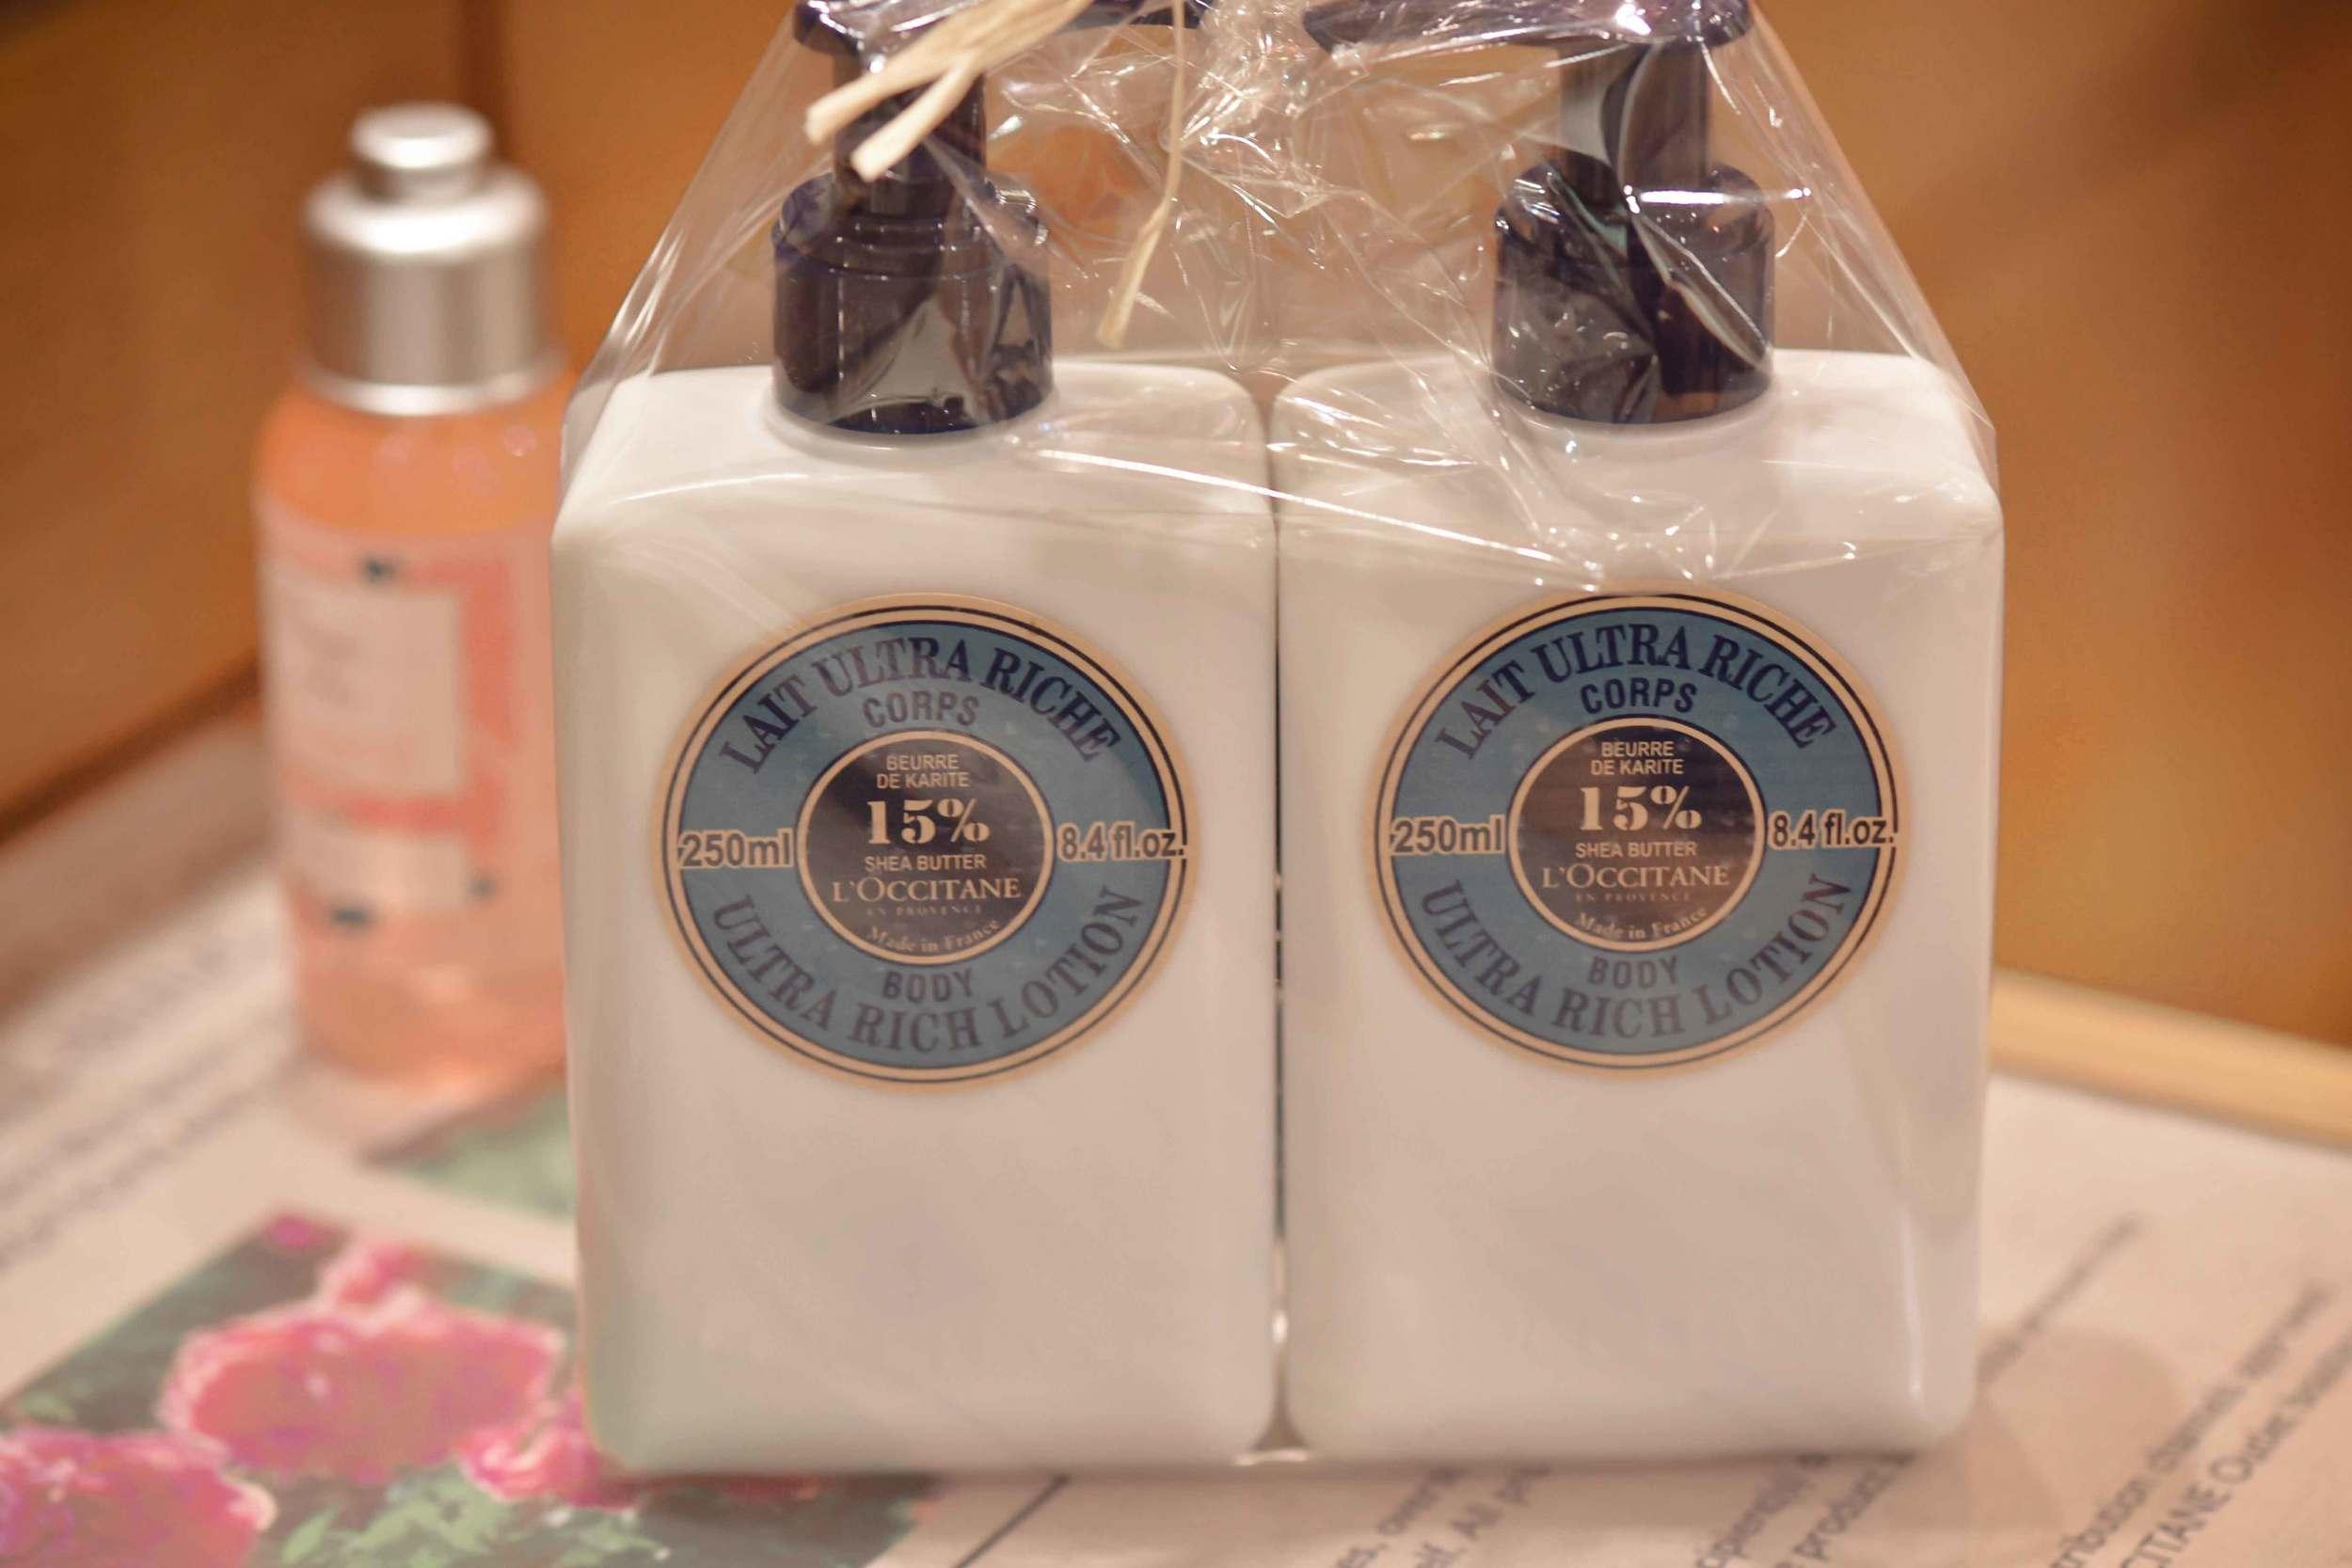 L'Occitane ultra rich body lotion, L'Occitane, Bicester village, designer shopping outlet near London, UK. Image©sourcingstyle.com